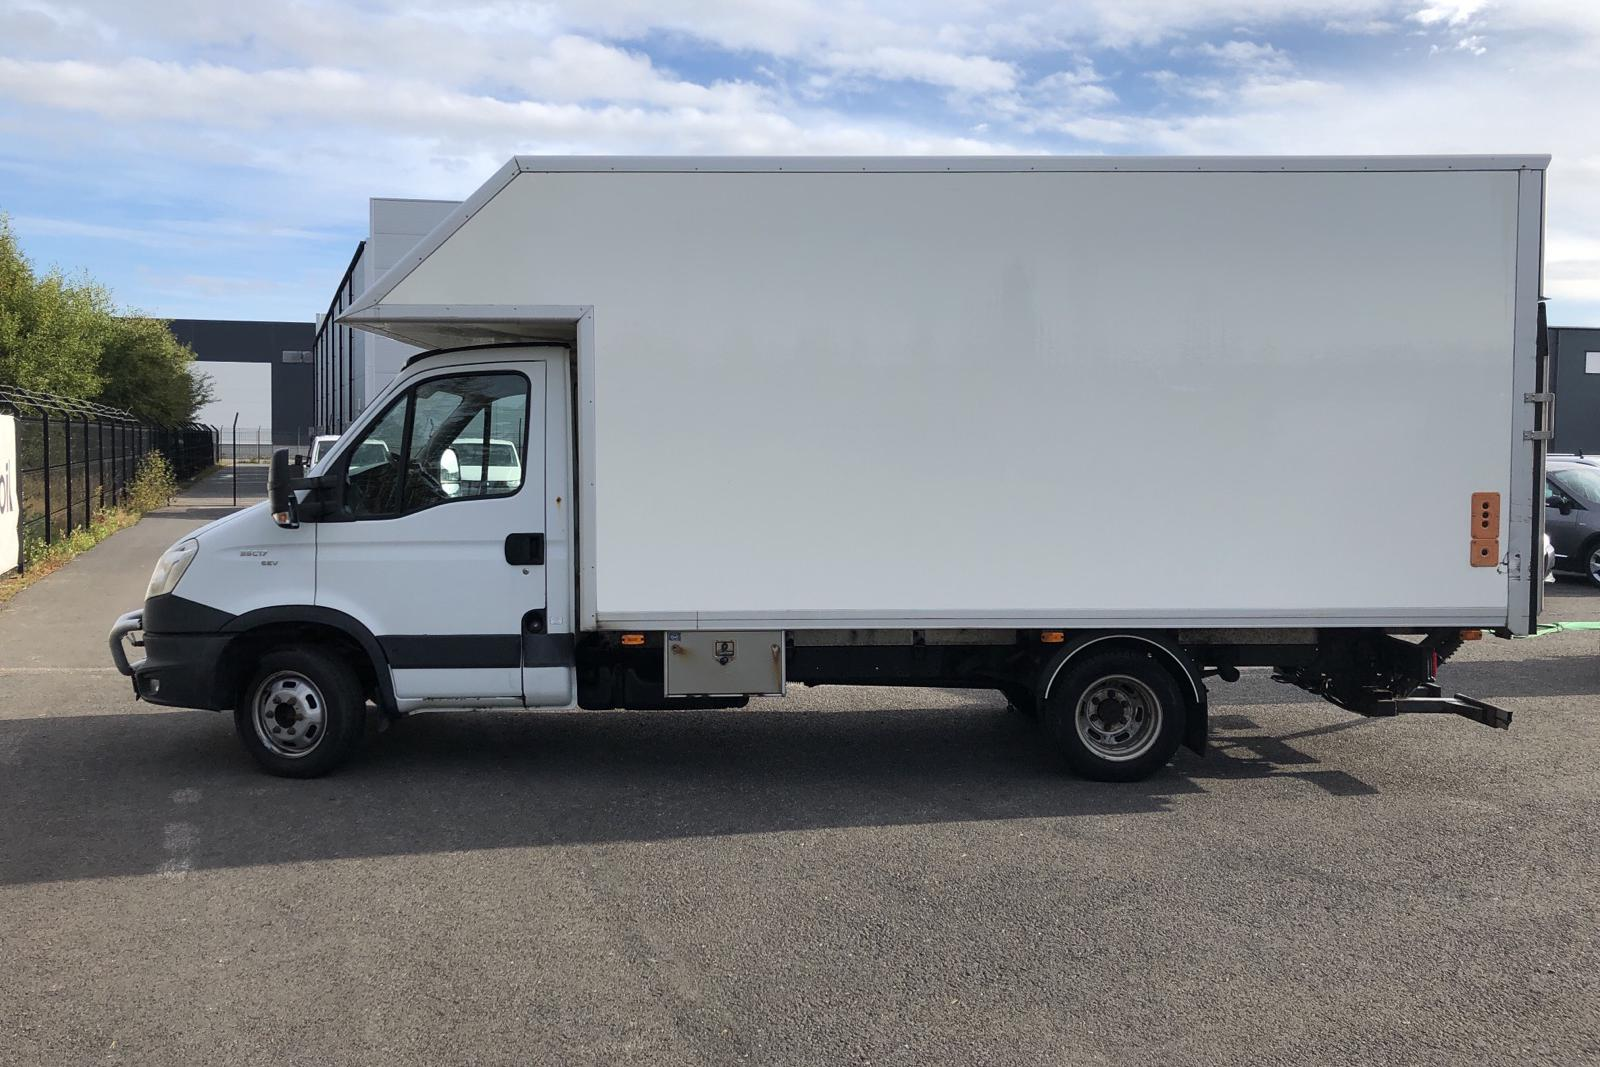 Iveco Daily 35 3.0 HPT EEV (170hk) - 261 690 km - Manual - white - 2012